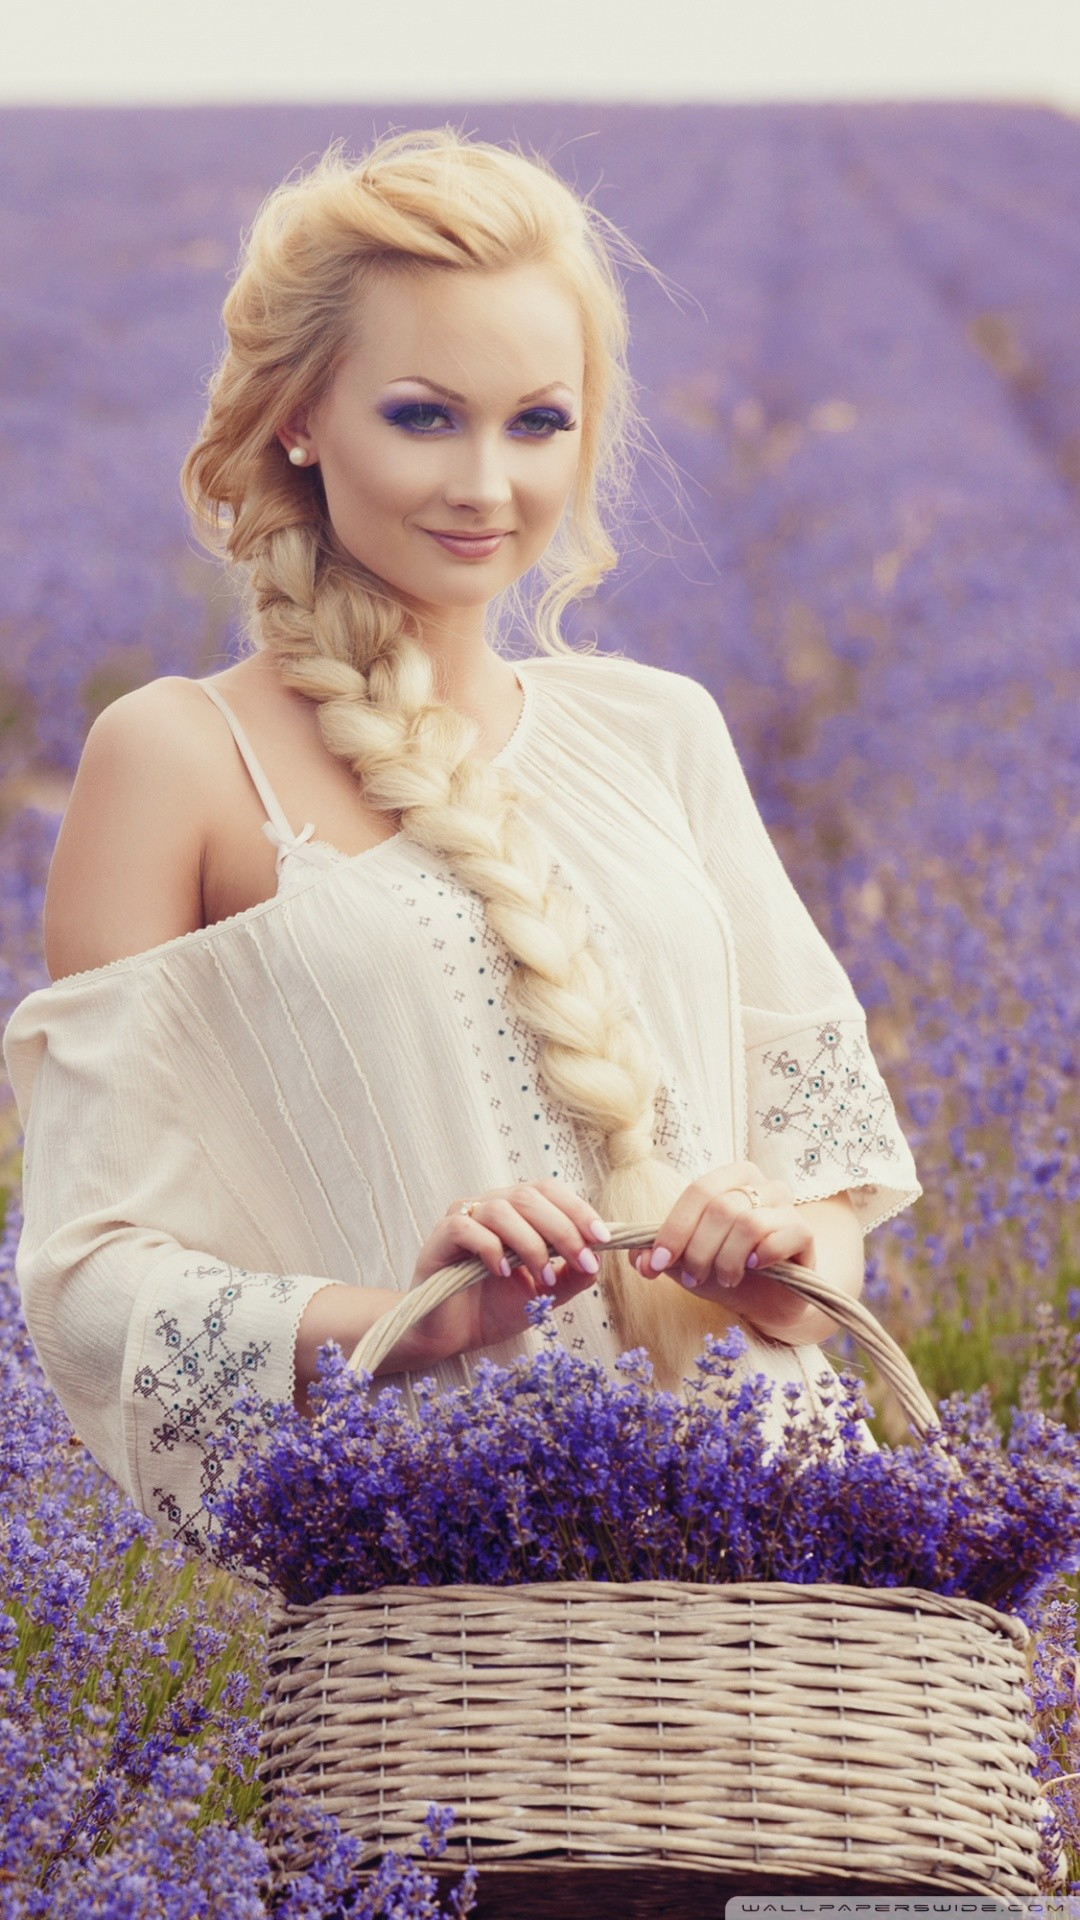 Free Lavender Field phone wallpaper by lovesetmatch